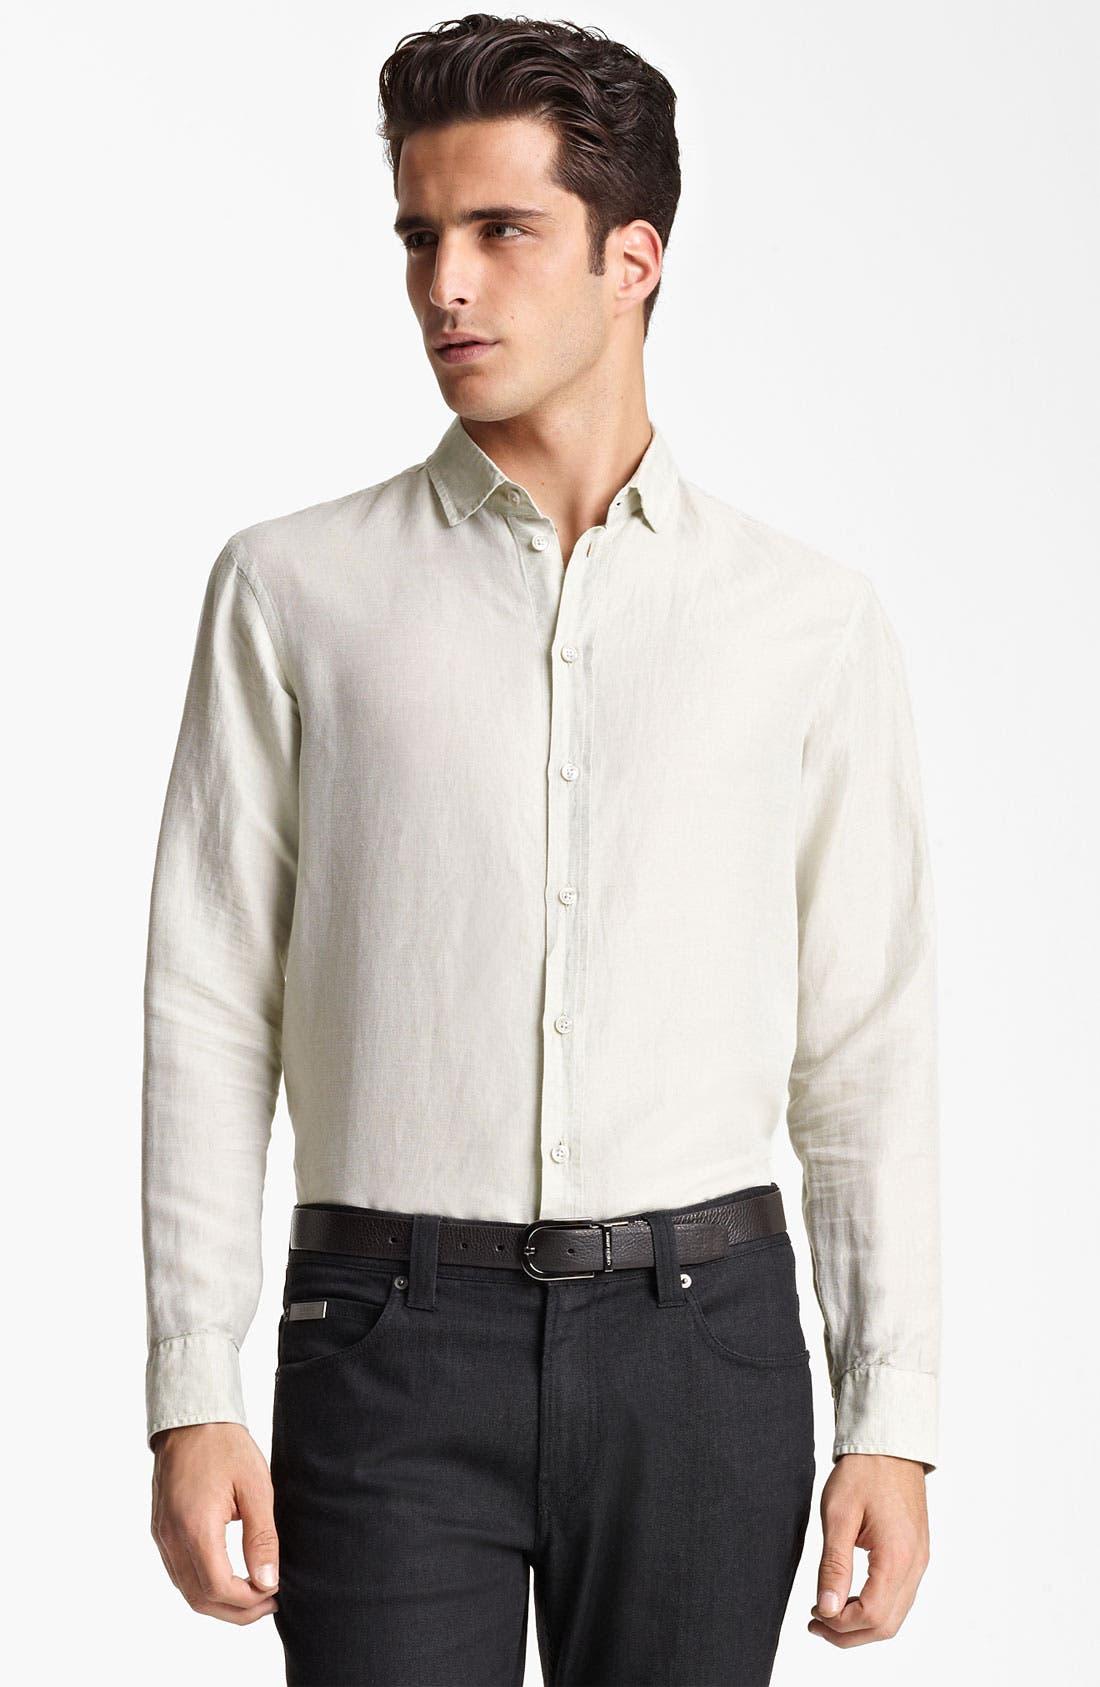 Alternate Image 1 Selected - Armani Collezioni Linen & Cotton Sport Shirt